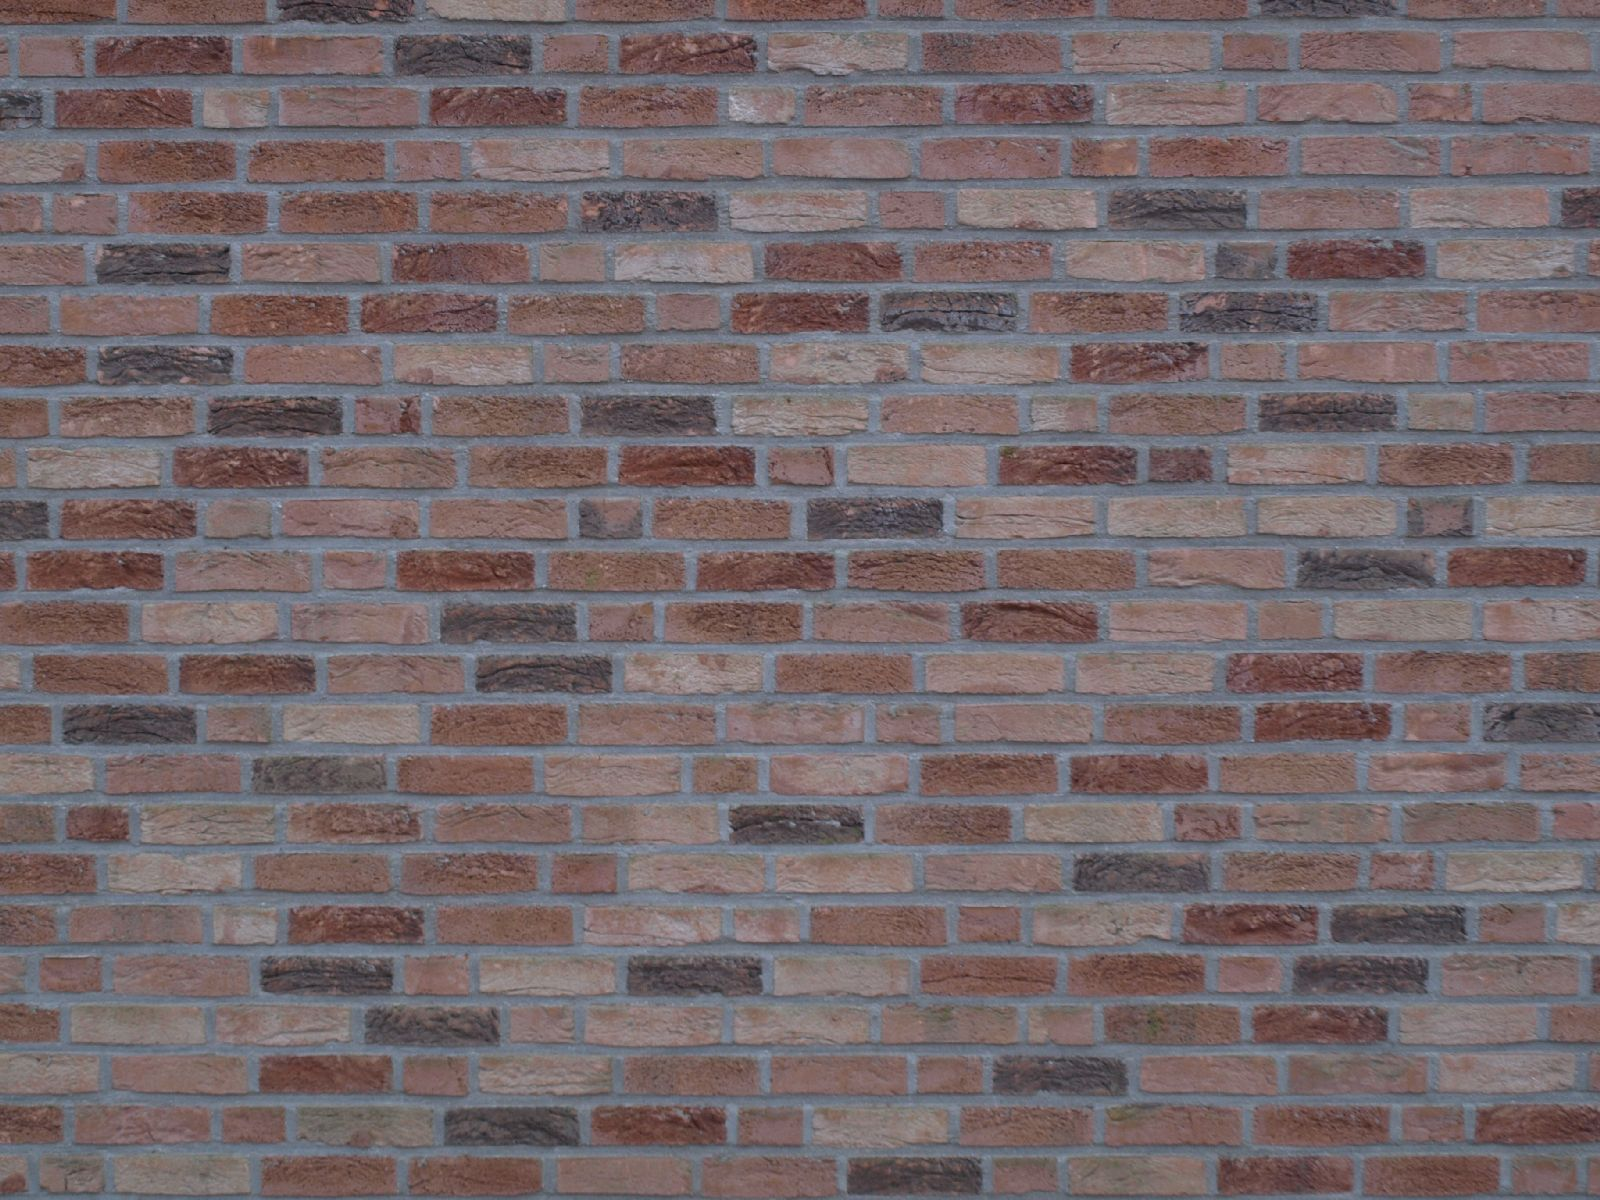 Wand-Mauerwerk-Backstein_Textur_A_P1018641